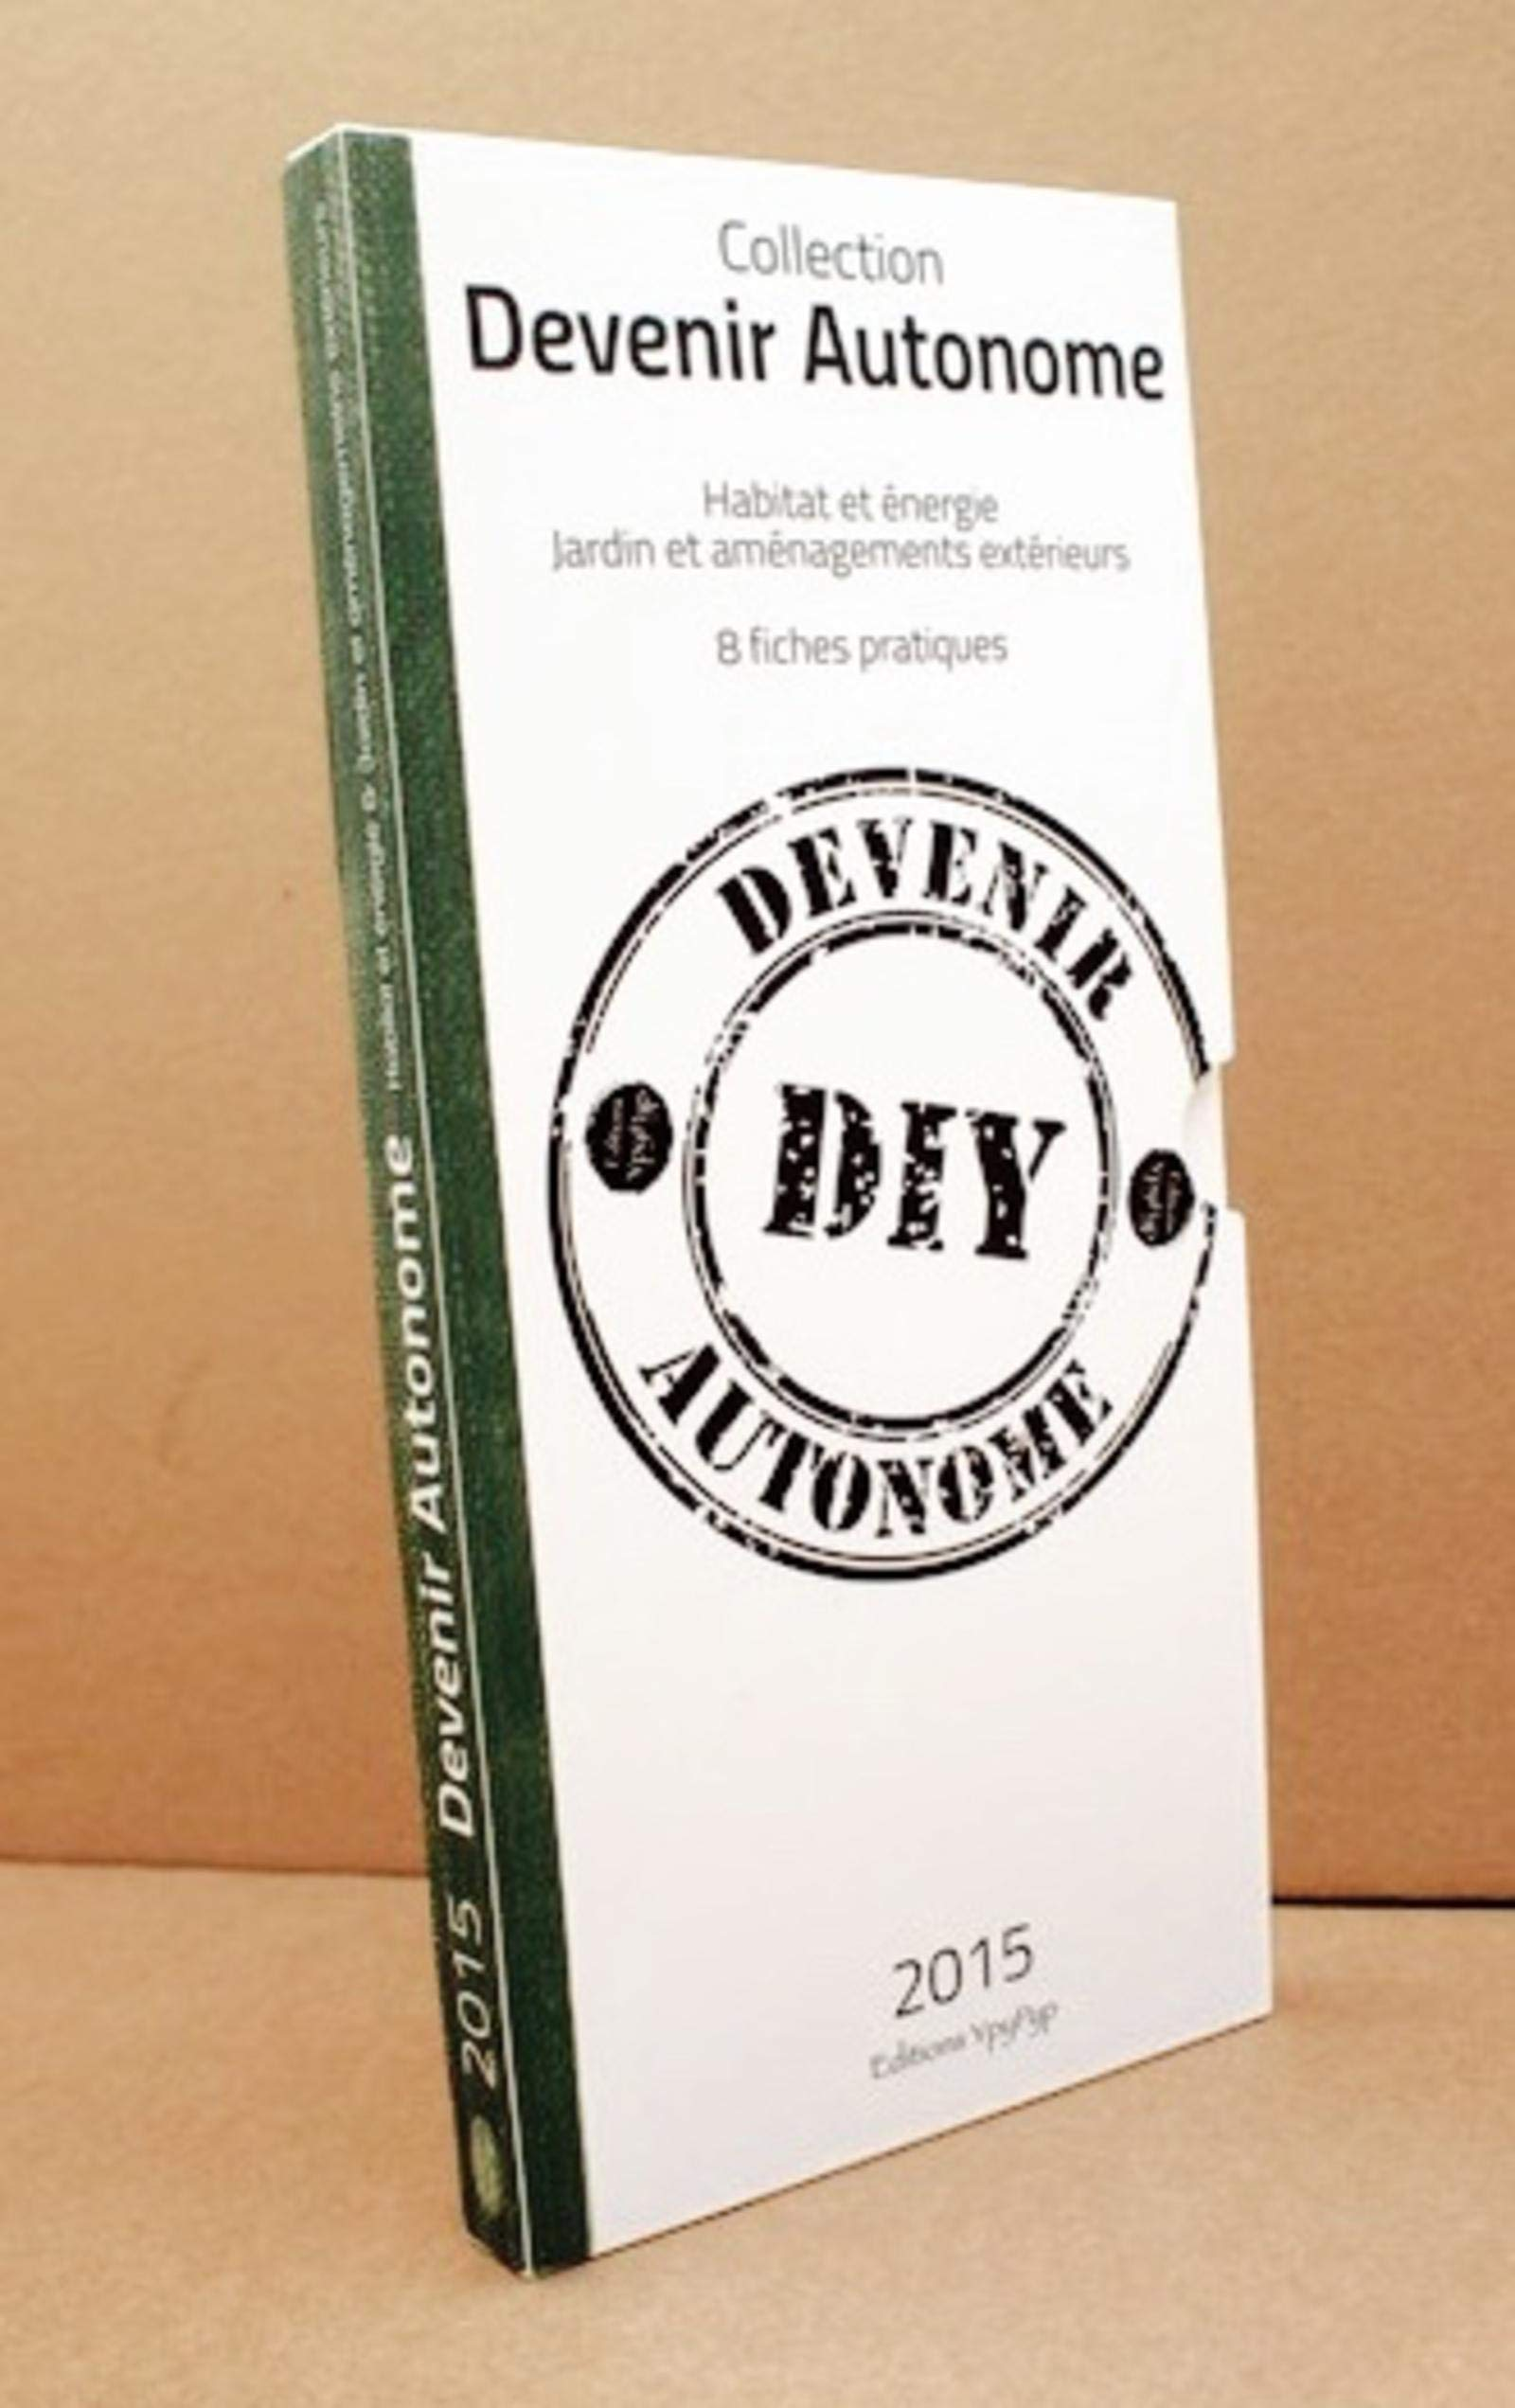 Coffret 8 fiches habitat et jardin (YPYPYP): Amazon.es: Ypypyp Ypypyp: Libros en idiomas extranjeros